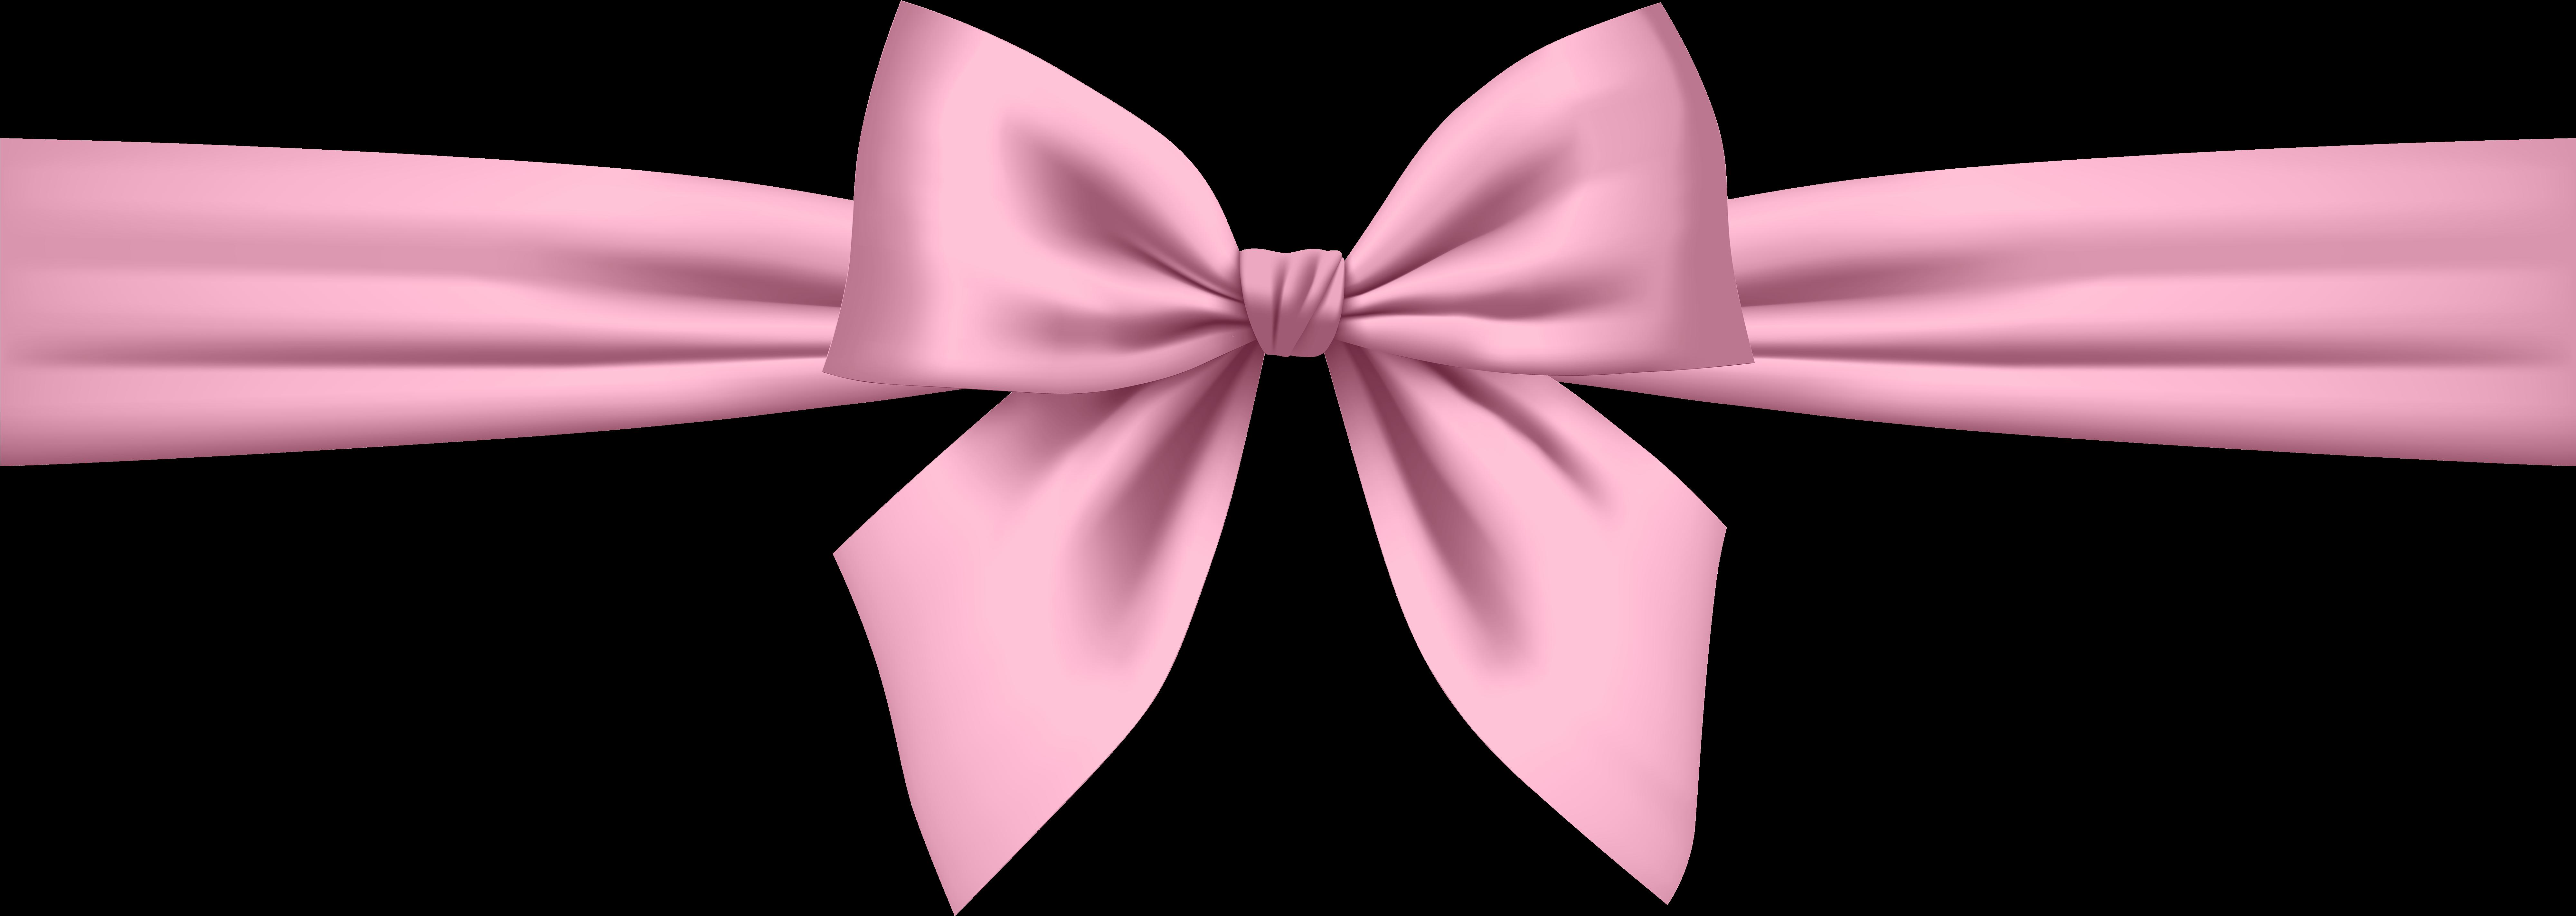 HD Soft Pink Bow Transparent Png Clip Art.